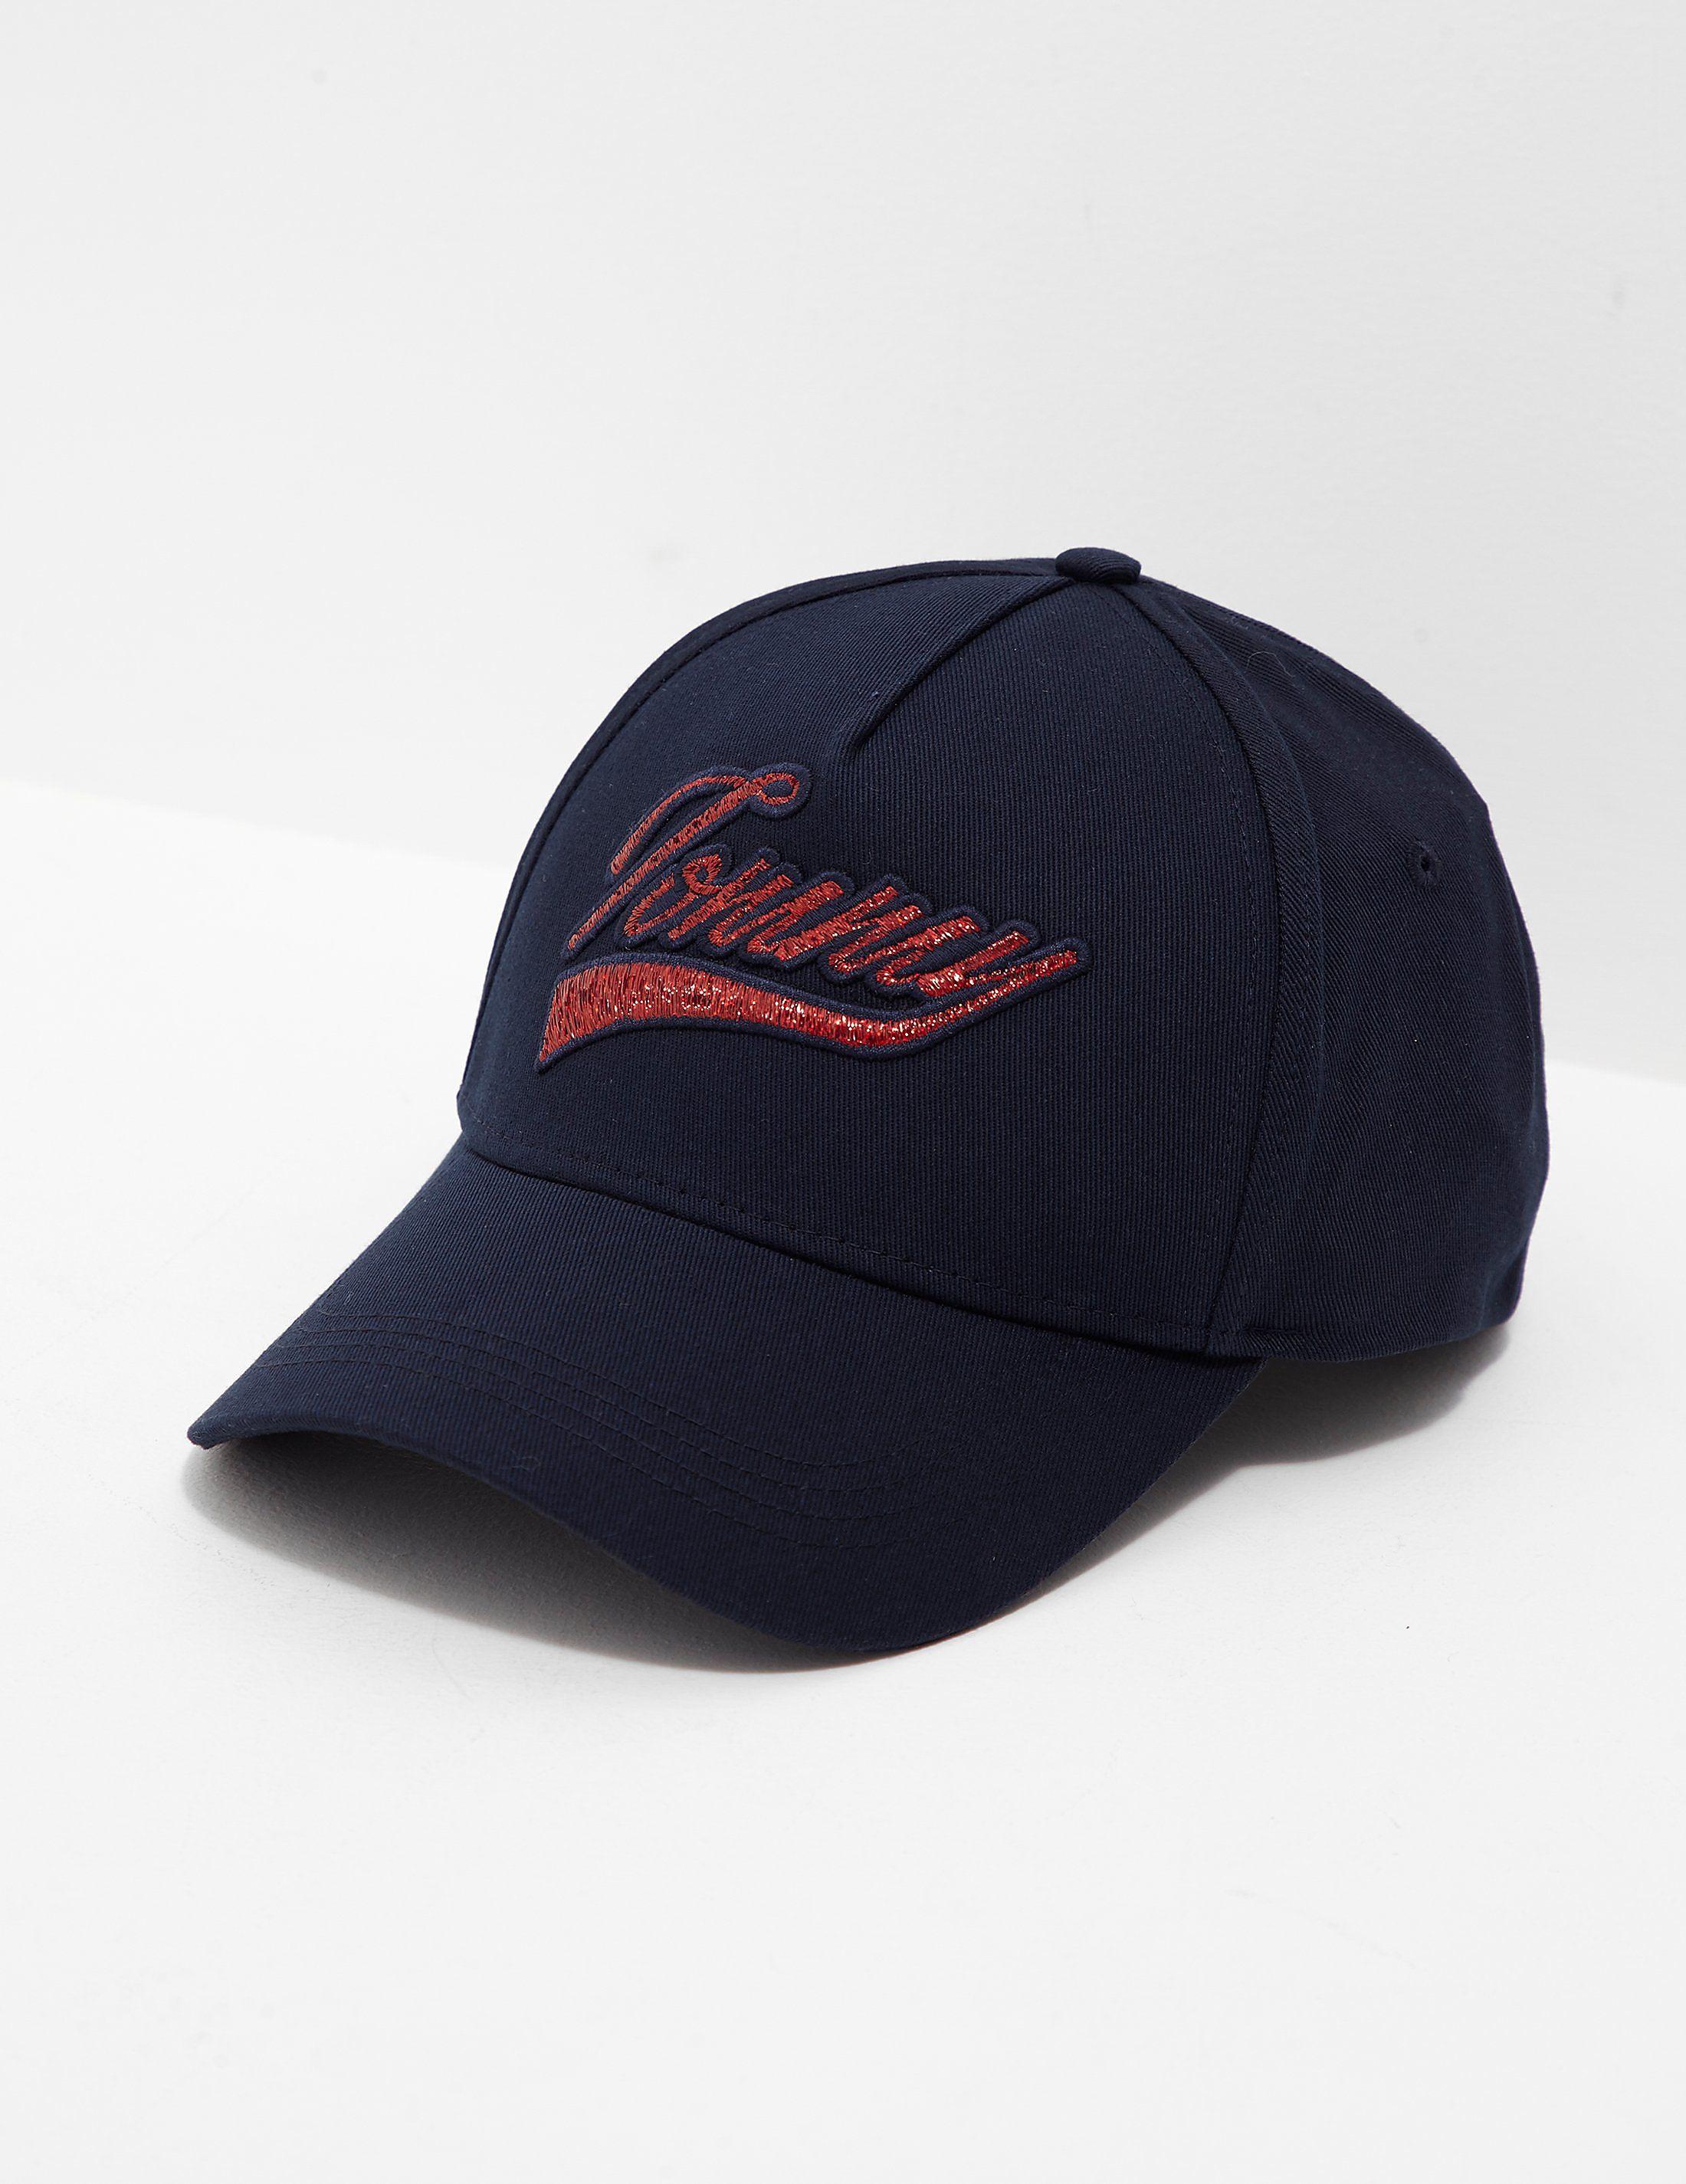 Tommy Hilfiger Urban Cap - Online Exclusive  8fe7706c444